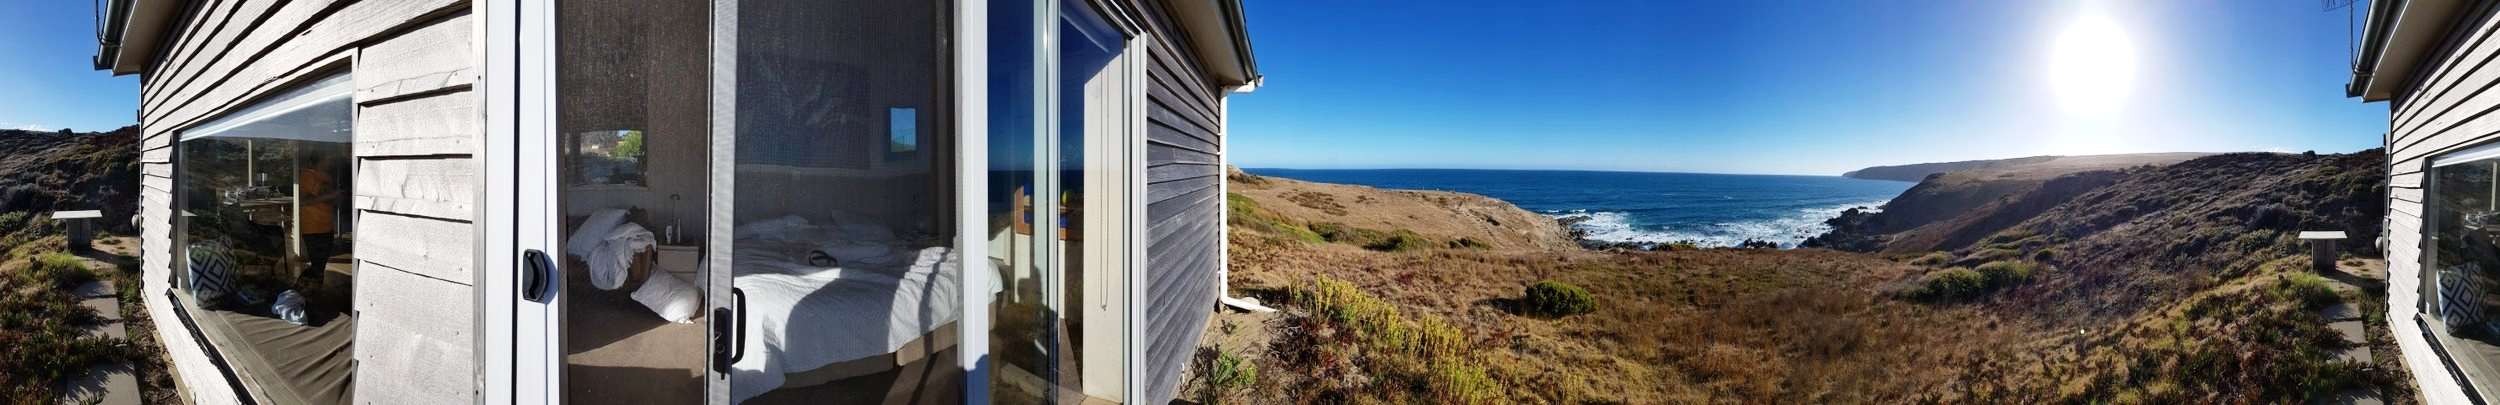 Home by the sea - Kings Beach Retreats